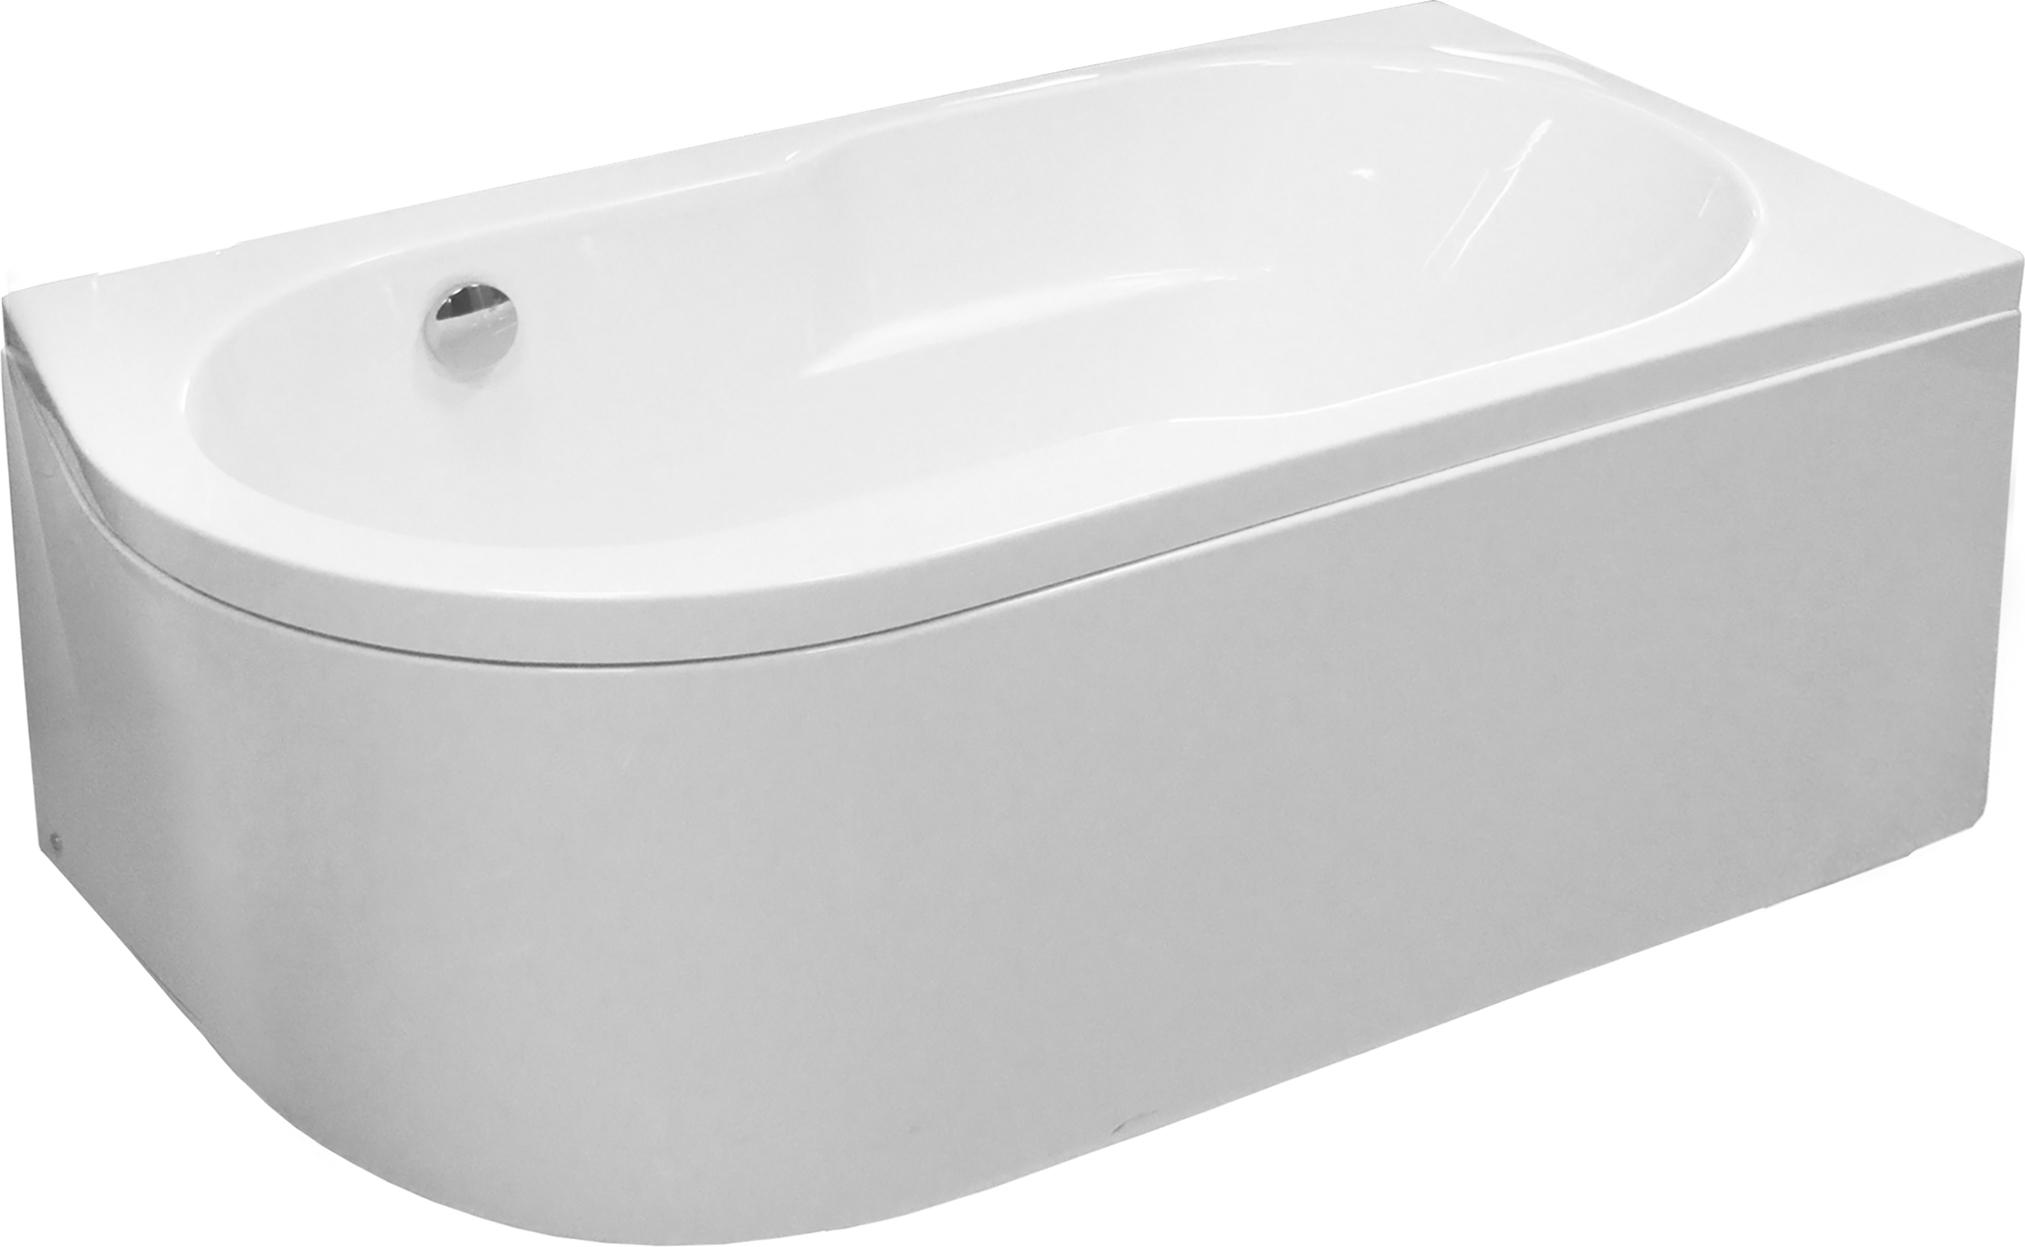 Акриловая ванна Royal Bath Azur RB 614200 L/R 140 см